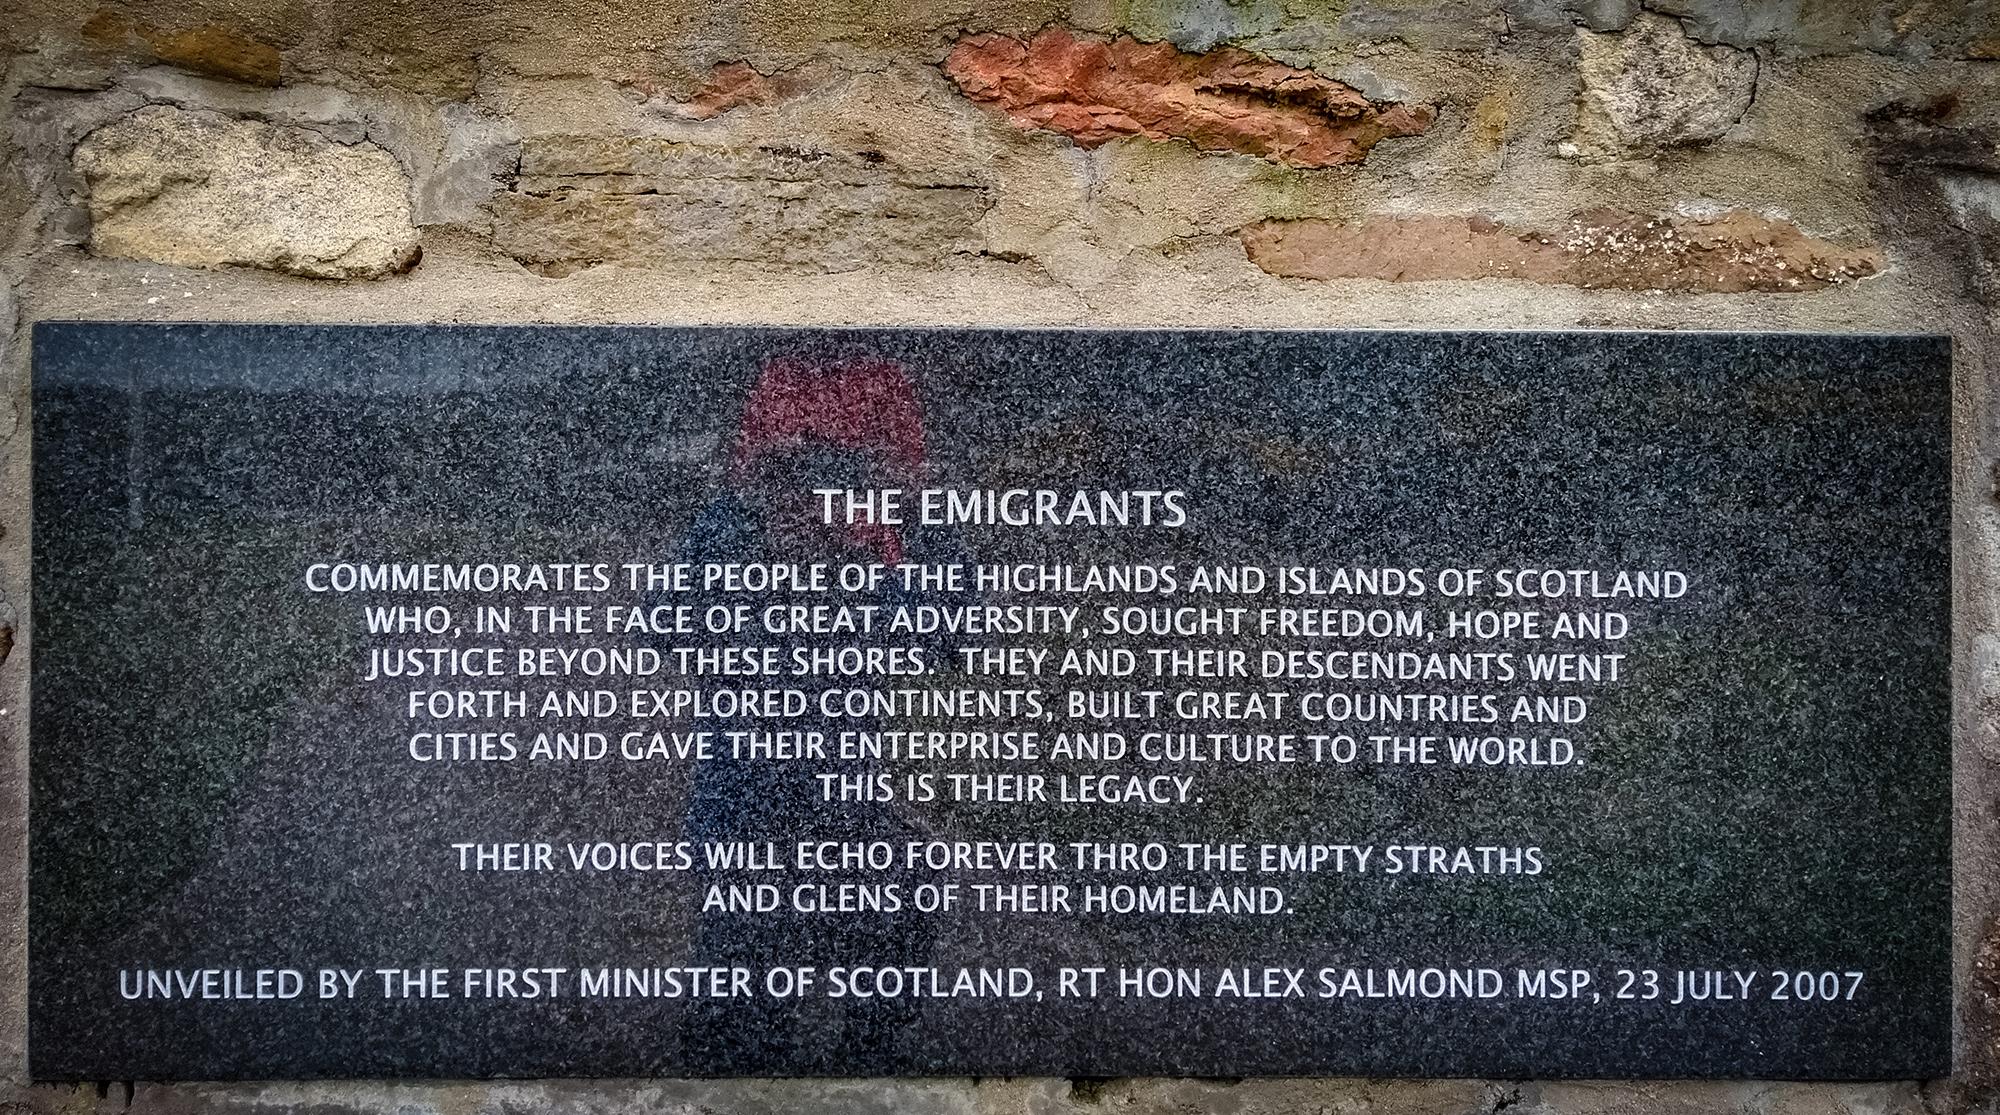 Tafel für die Emigtranten am Denkmal in Helmsdale